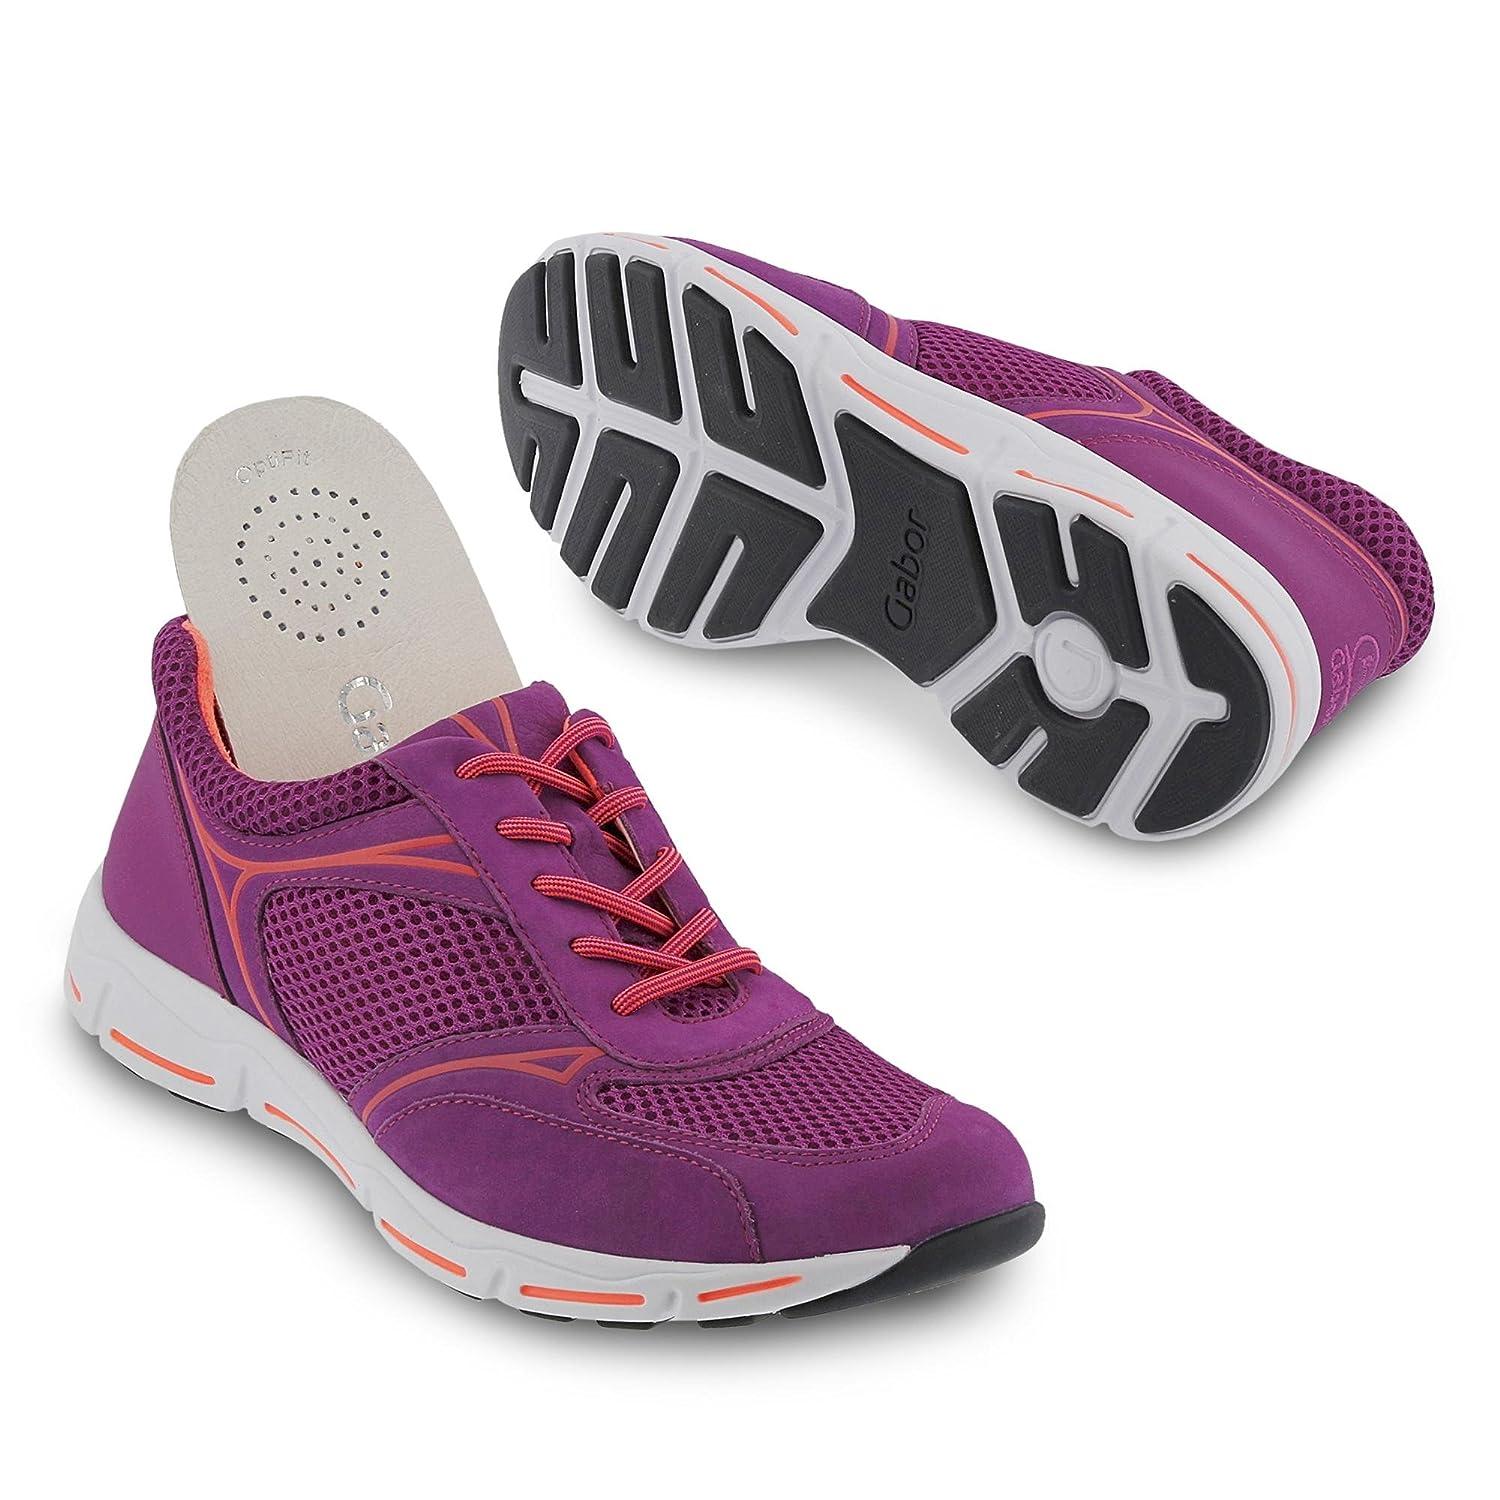 Gabor Comfort Damenschuhe 46.375 Sneaker Damen Schnürhalbschuhe Sneaker 46.375 Violetta/Orange 034882